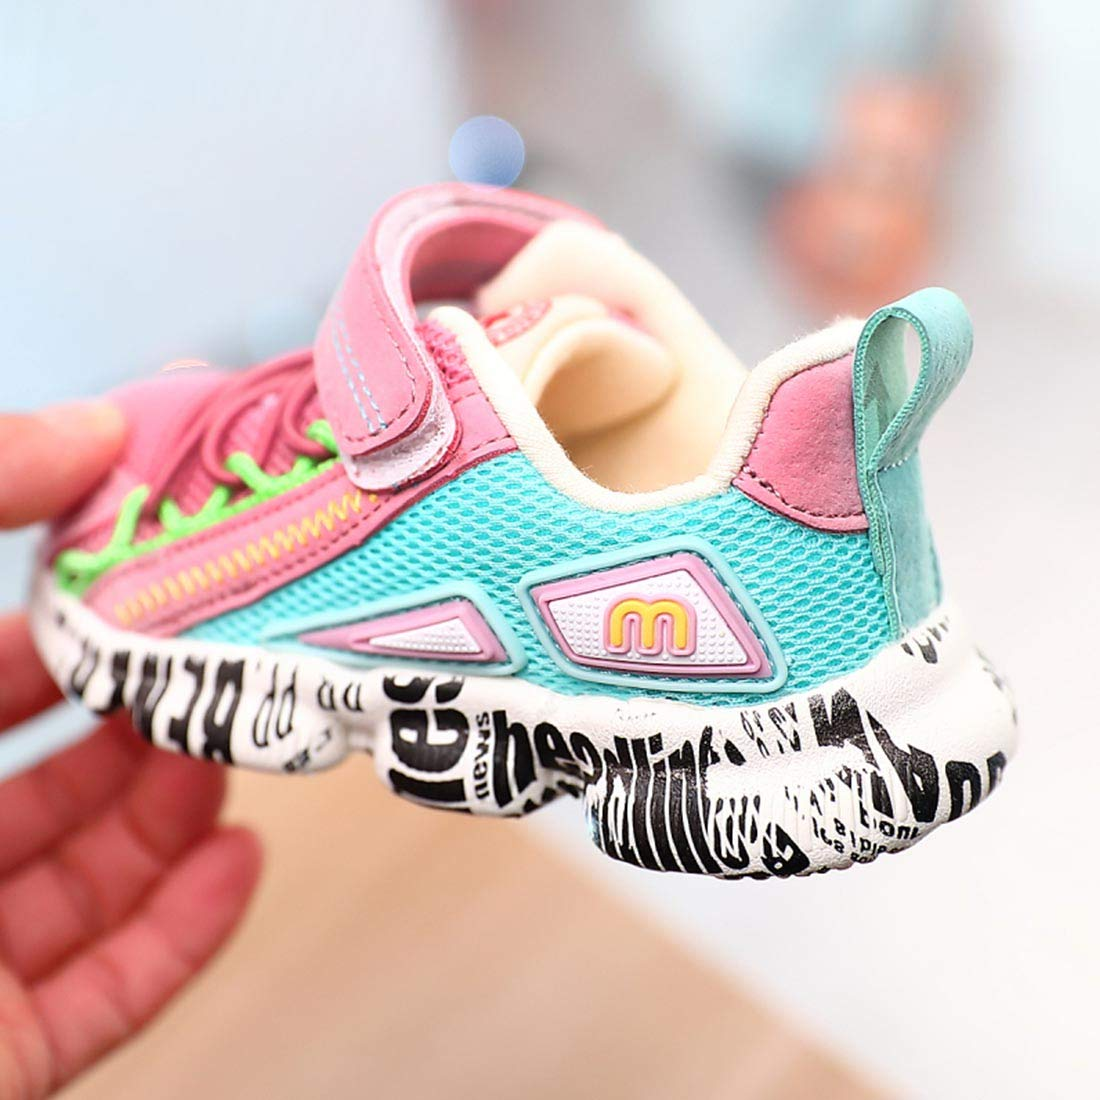 YIBLBOX Kids Baby Boys Girls Breathable Mesh Shoes Unisex Children Sport Running Sneakers